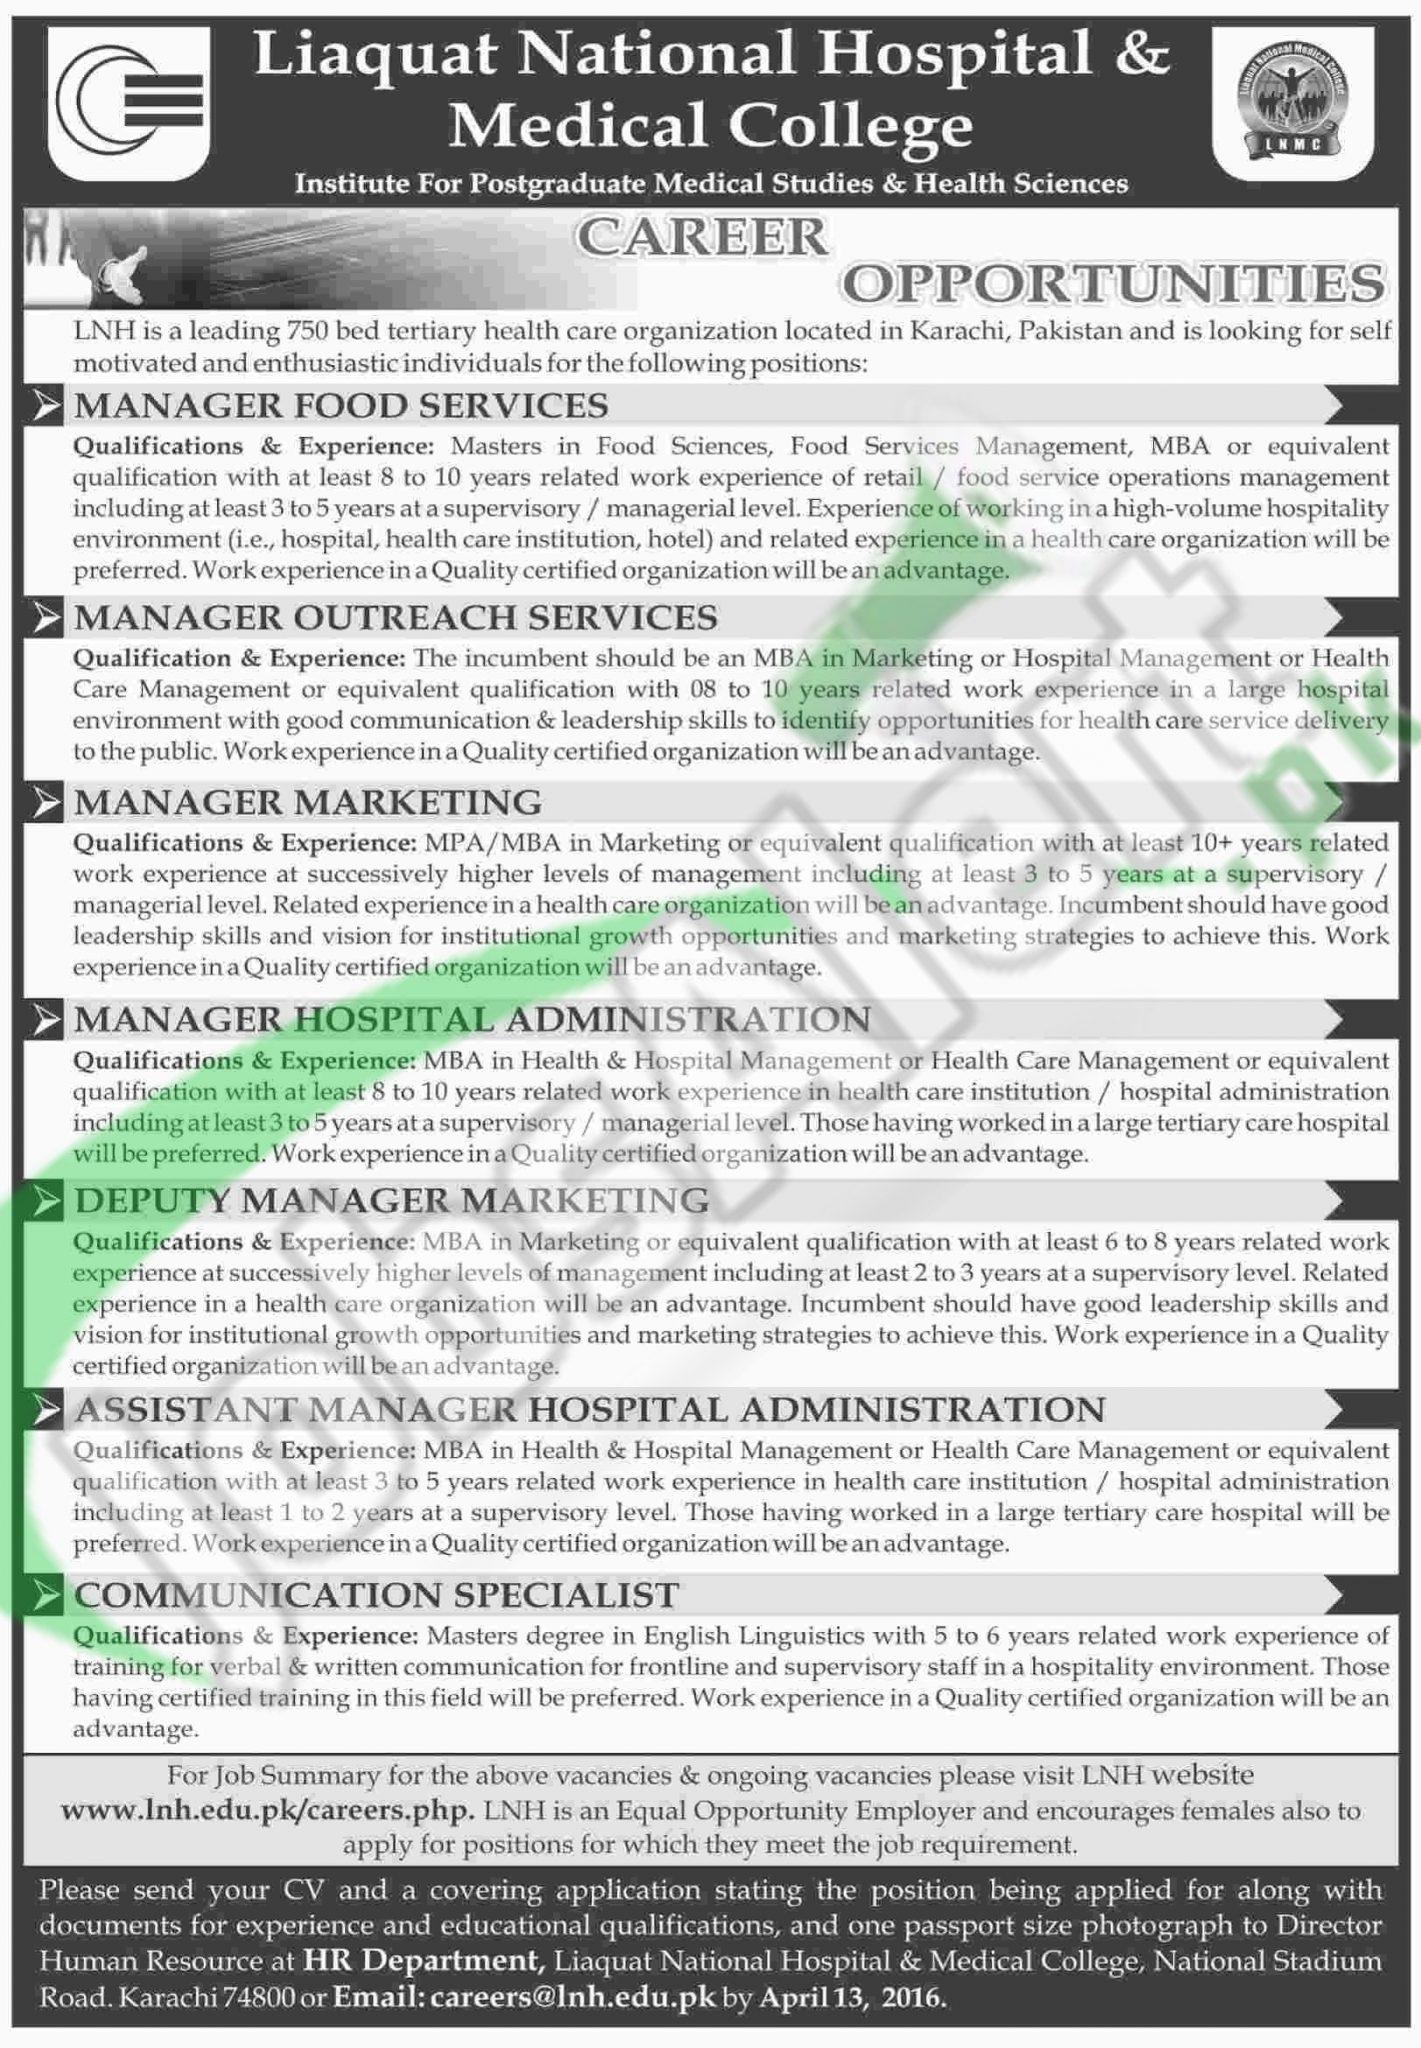 Liaquat National Hospital & Medical College Karachi Jobs 2016 Latest Advertisement